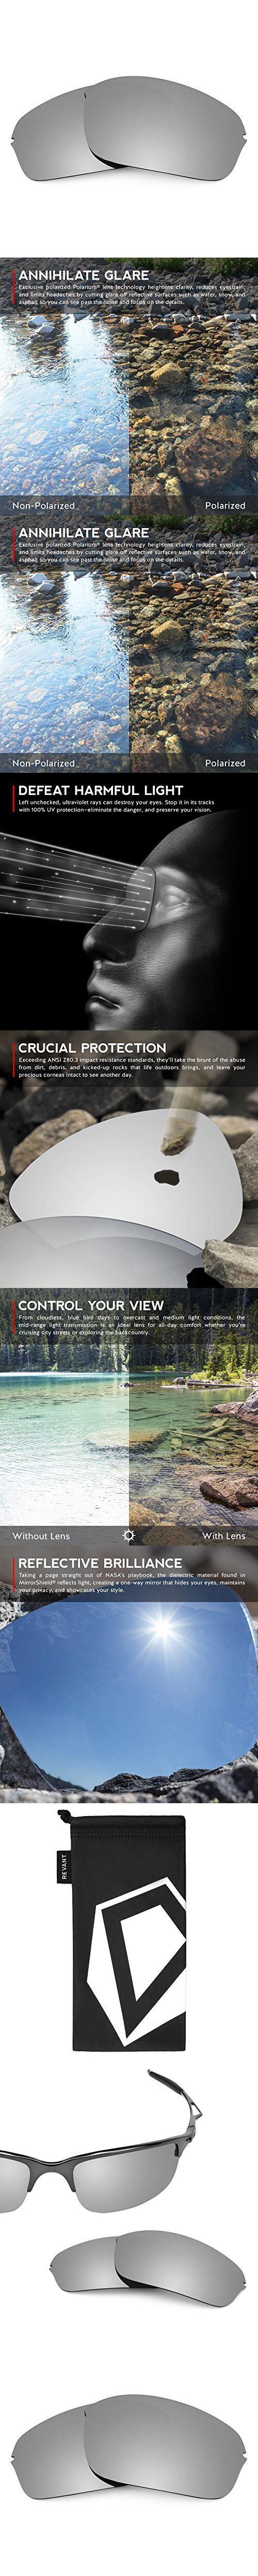 1b418cecdb16 Revant Lenses for Oakley Half Wire 2.0 Polarized Titanium ...